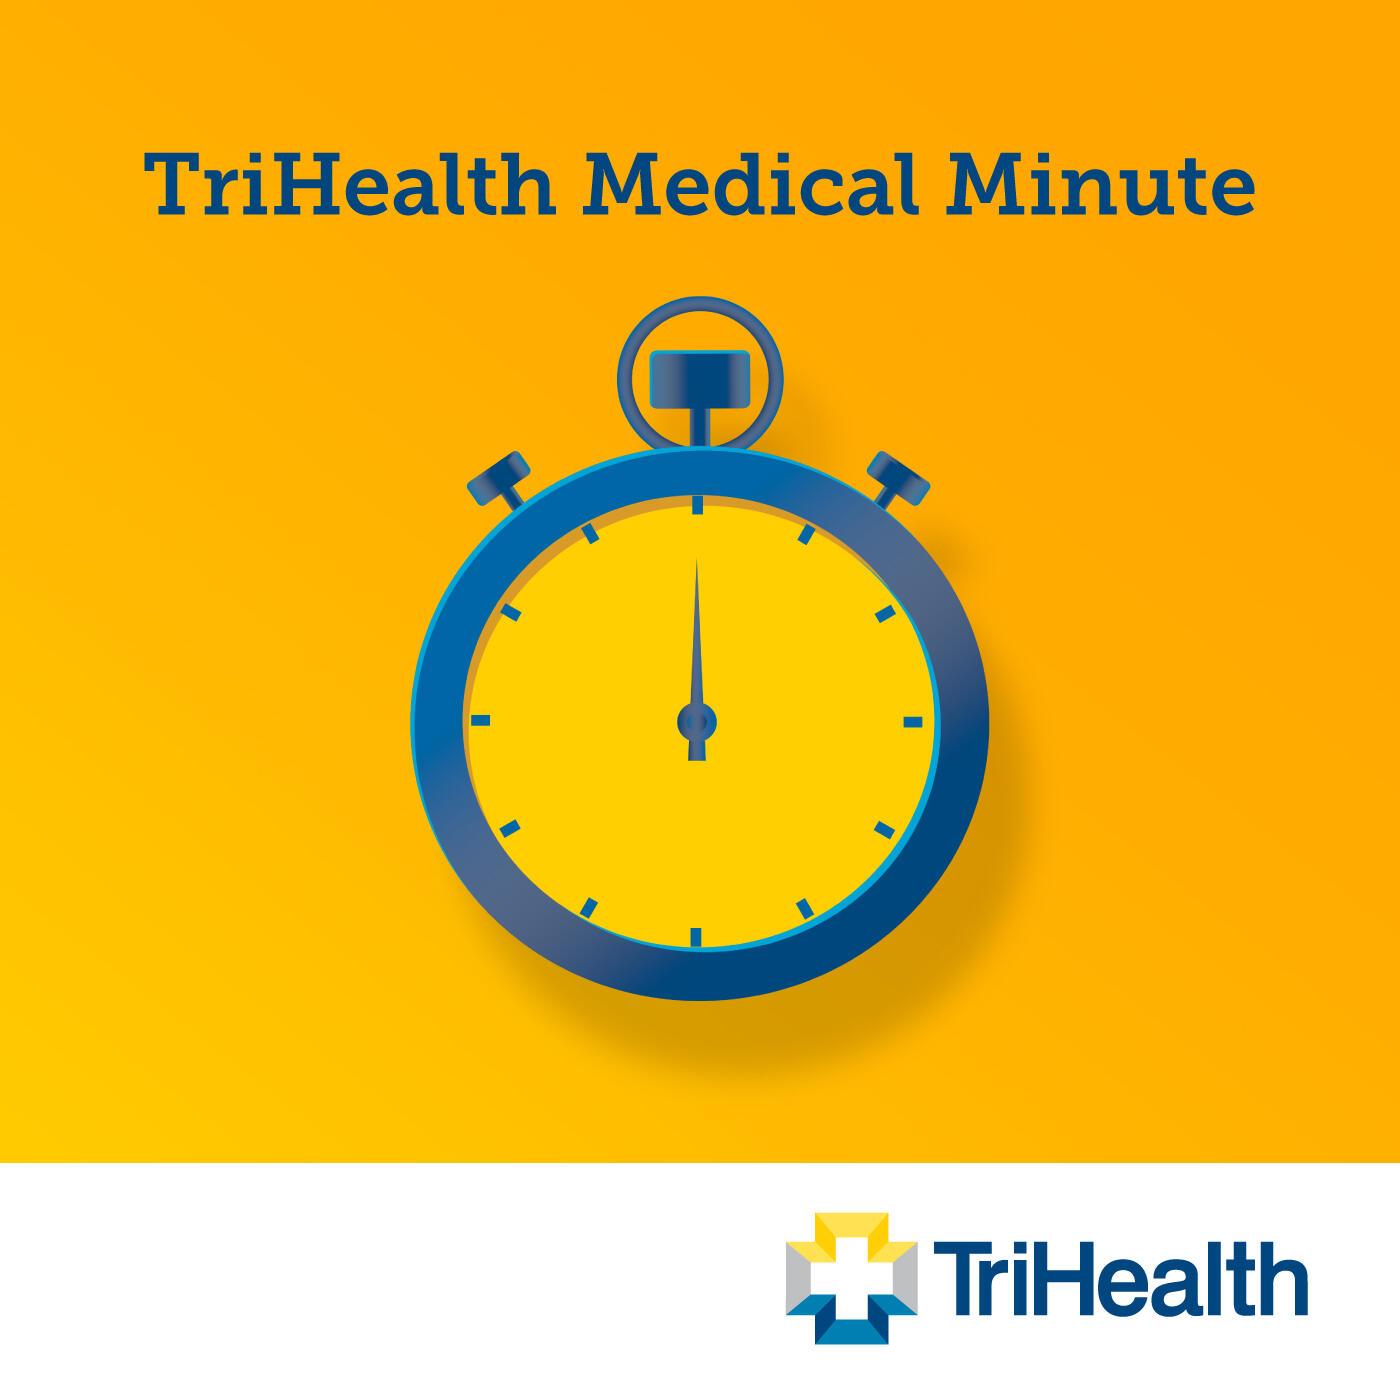 TriHealth Medical Minute